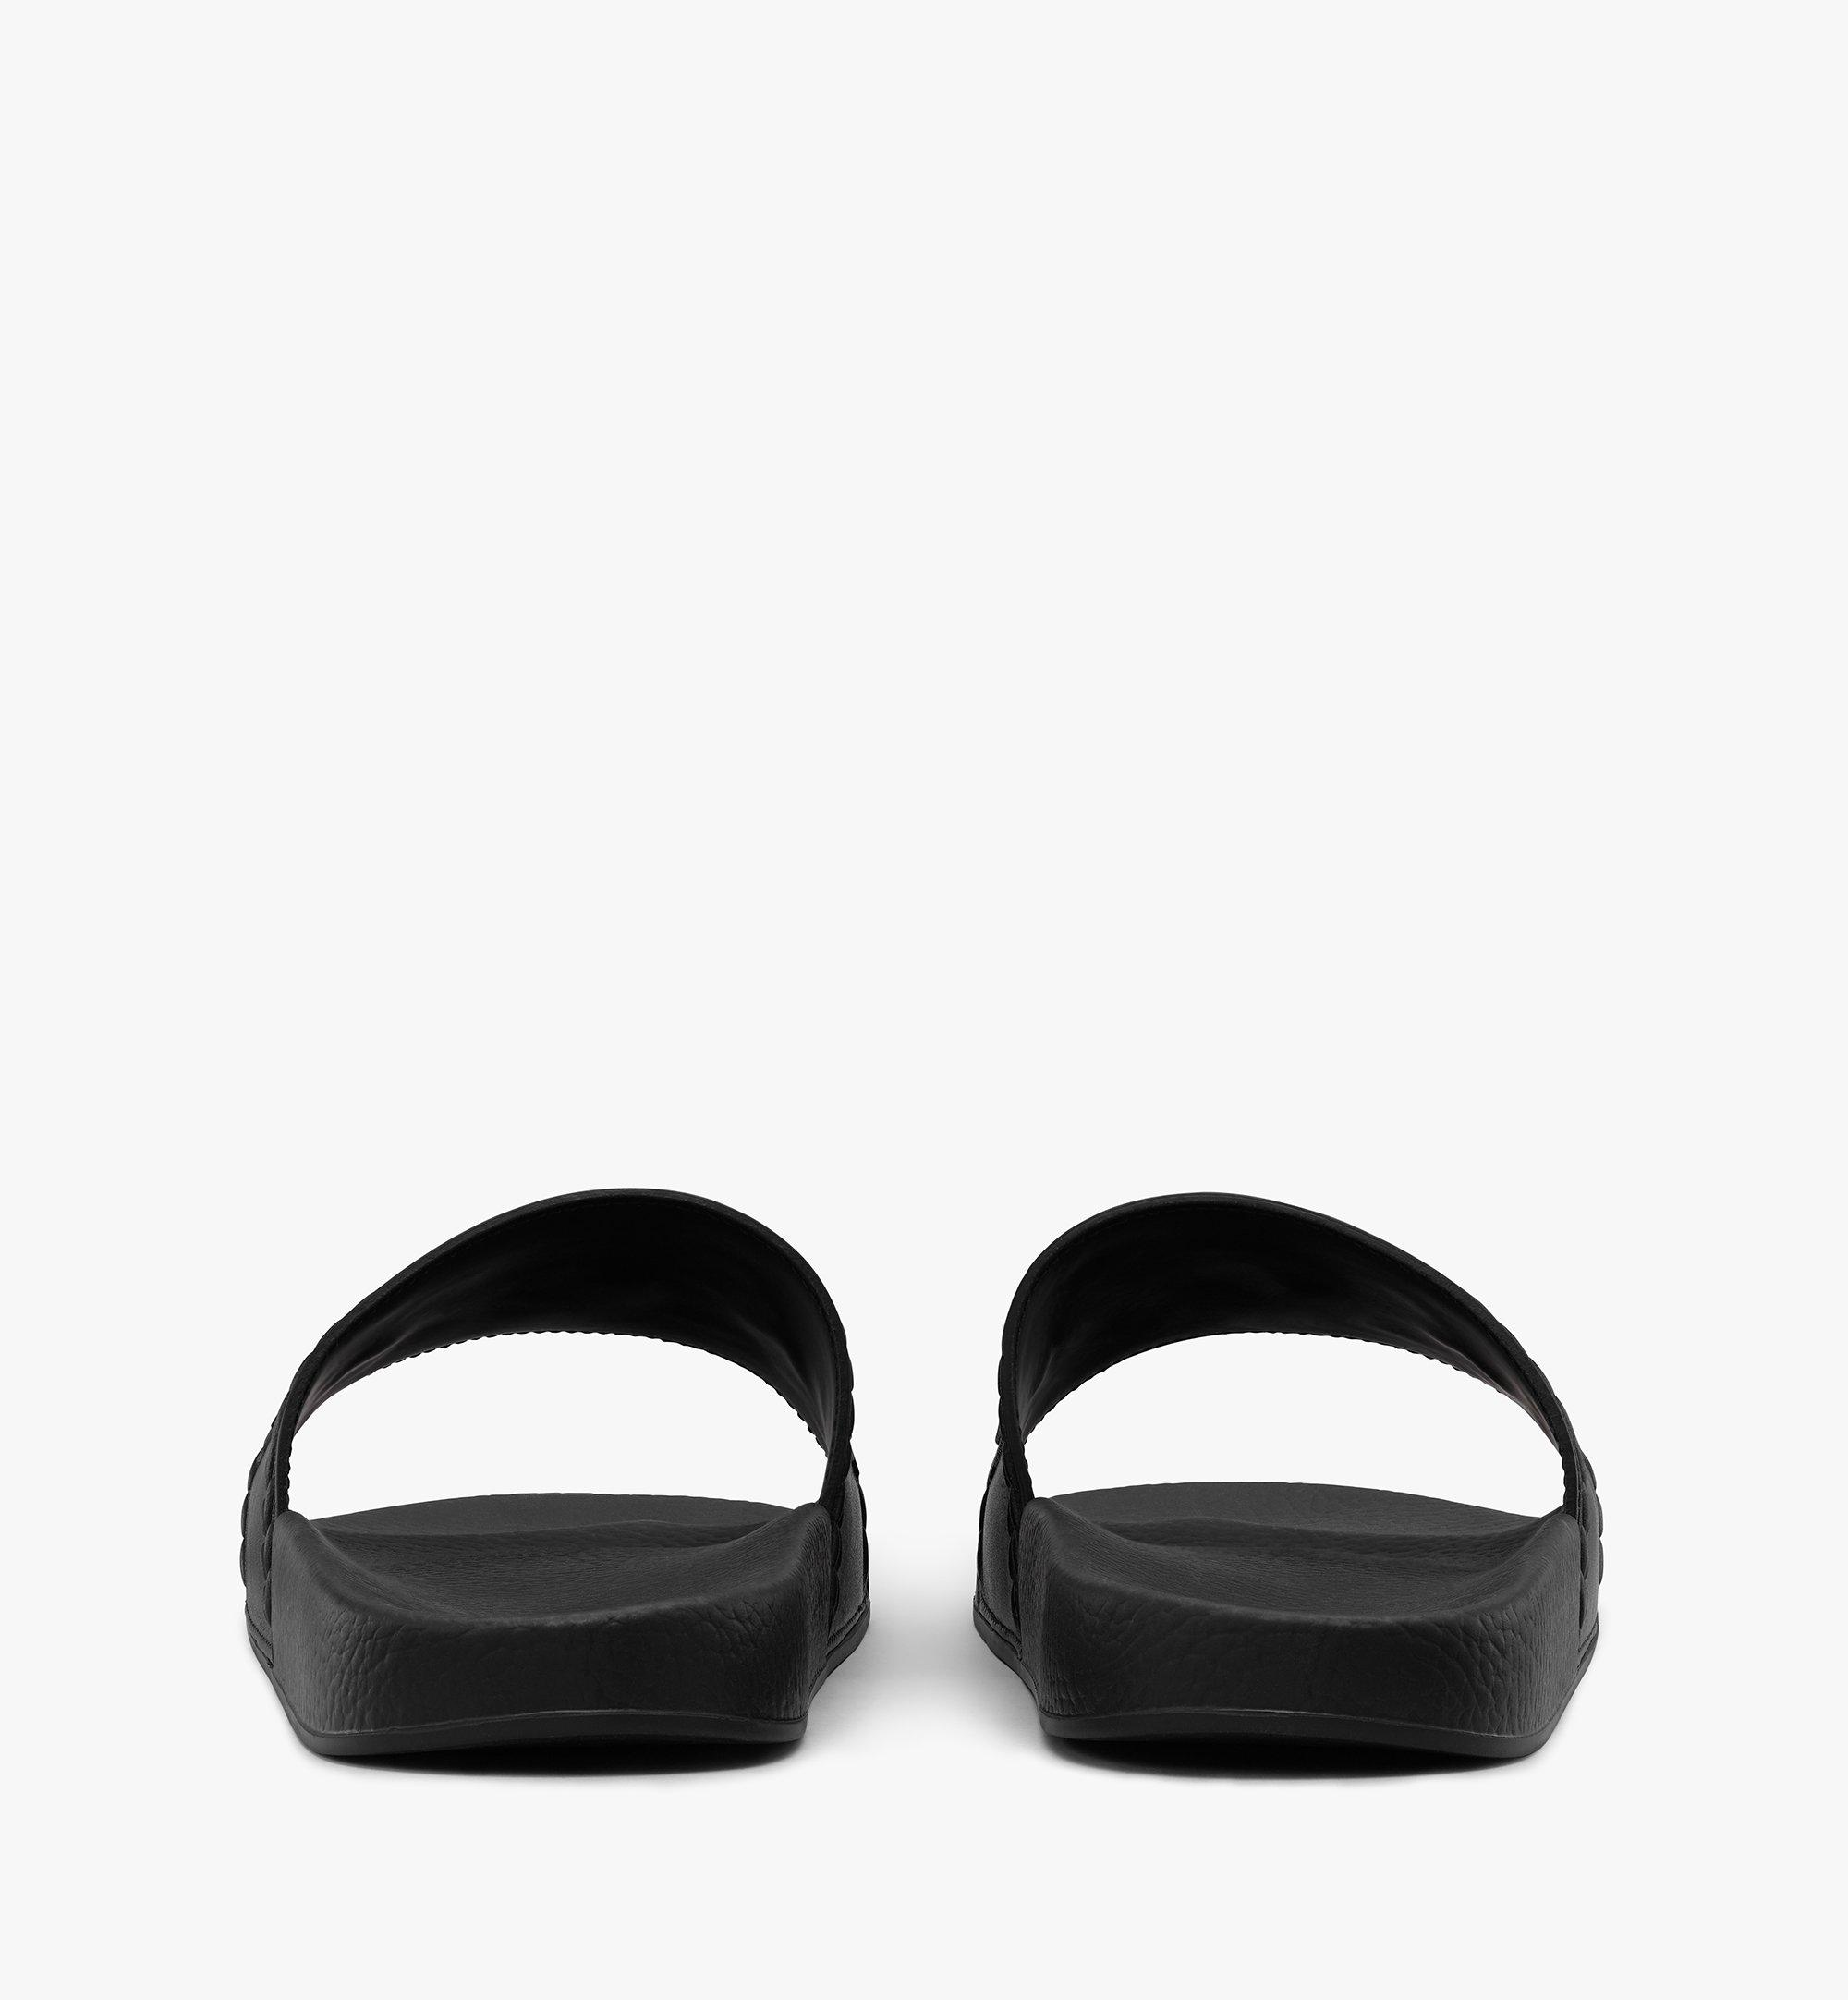 MCM 男士Big Logo拖鞋 Black MEXASMM21BK041 更多视角 2